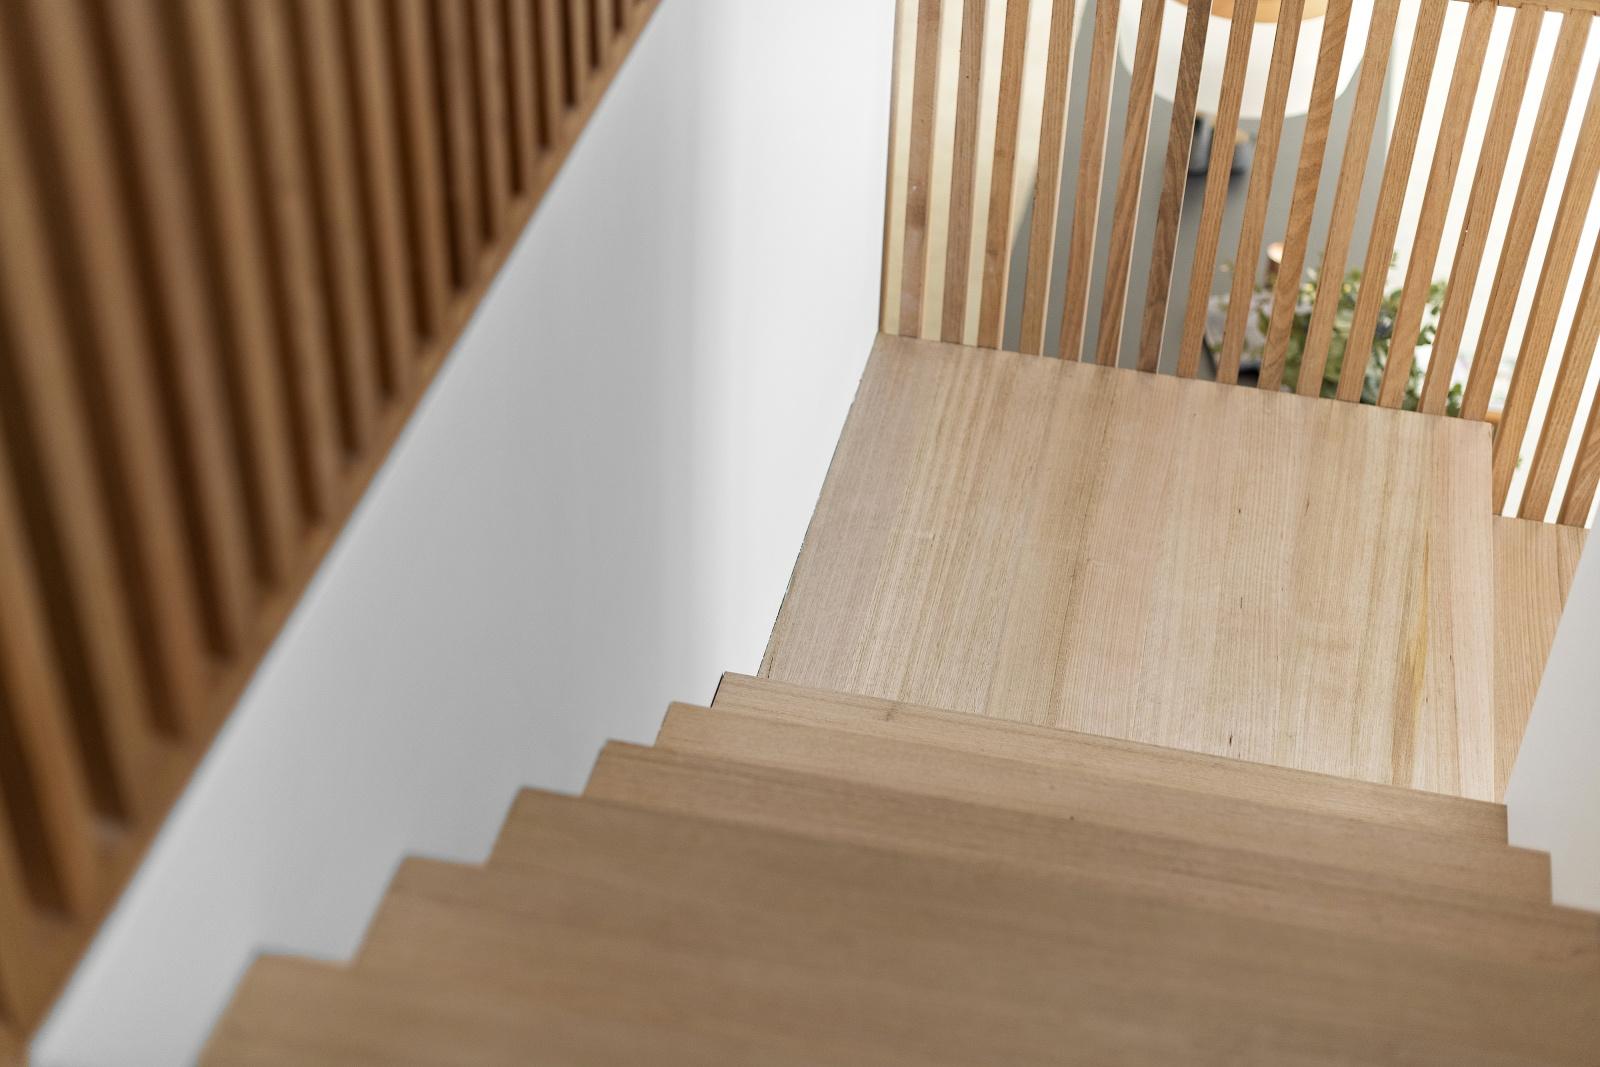 lifespaces_group_bluestonehouse_stairs.jpg